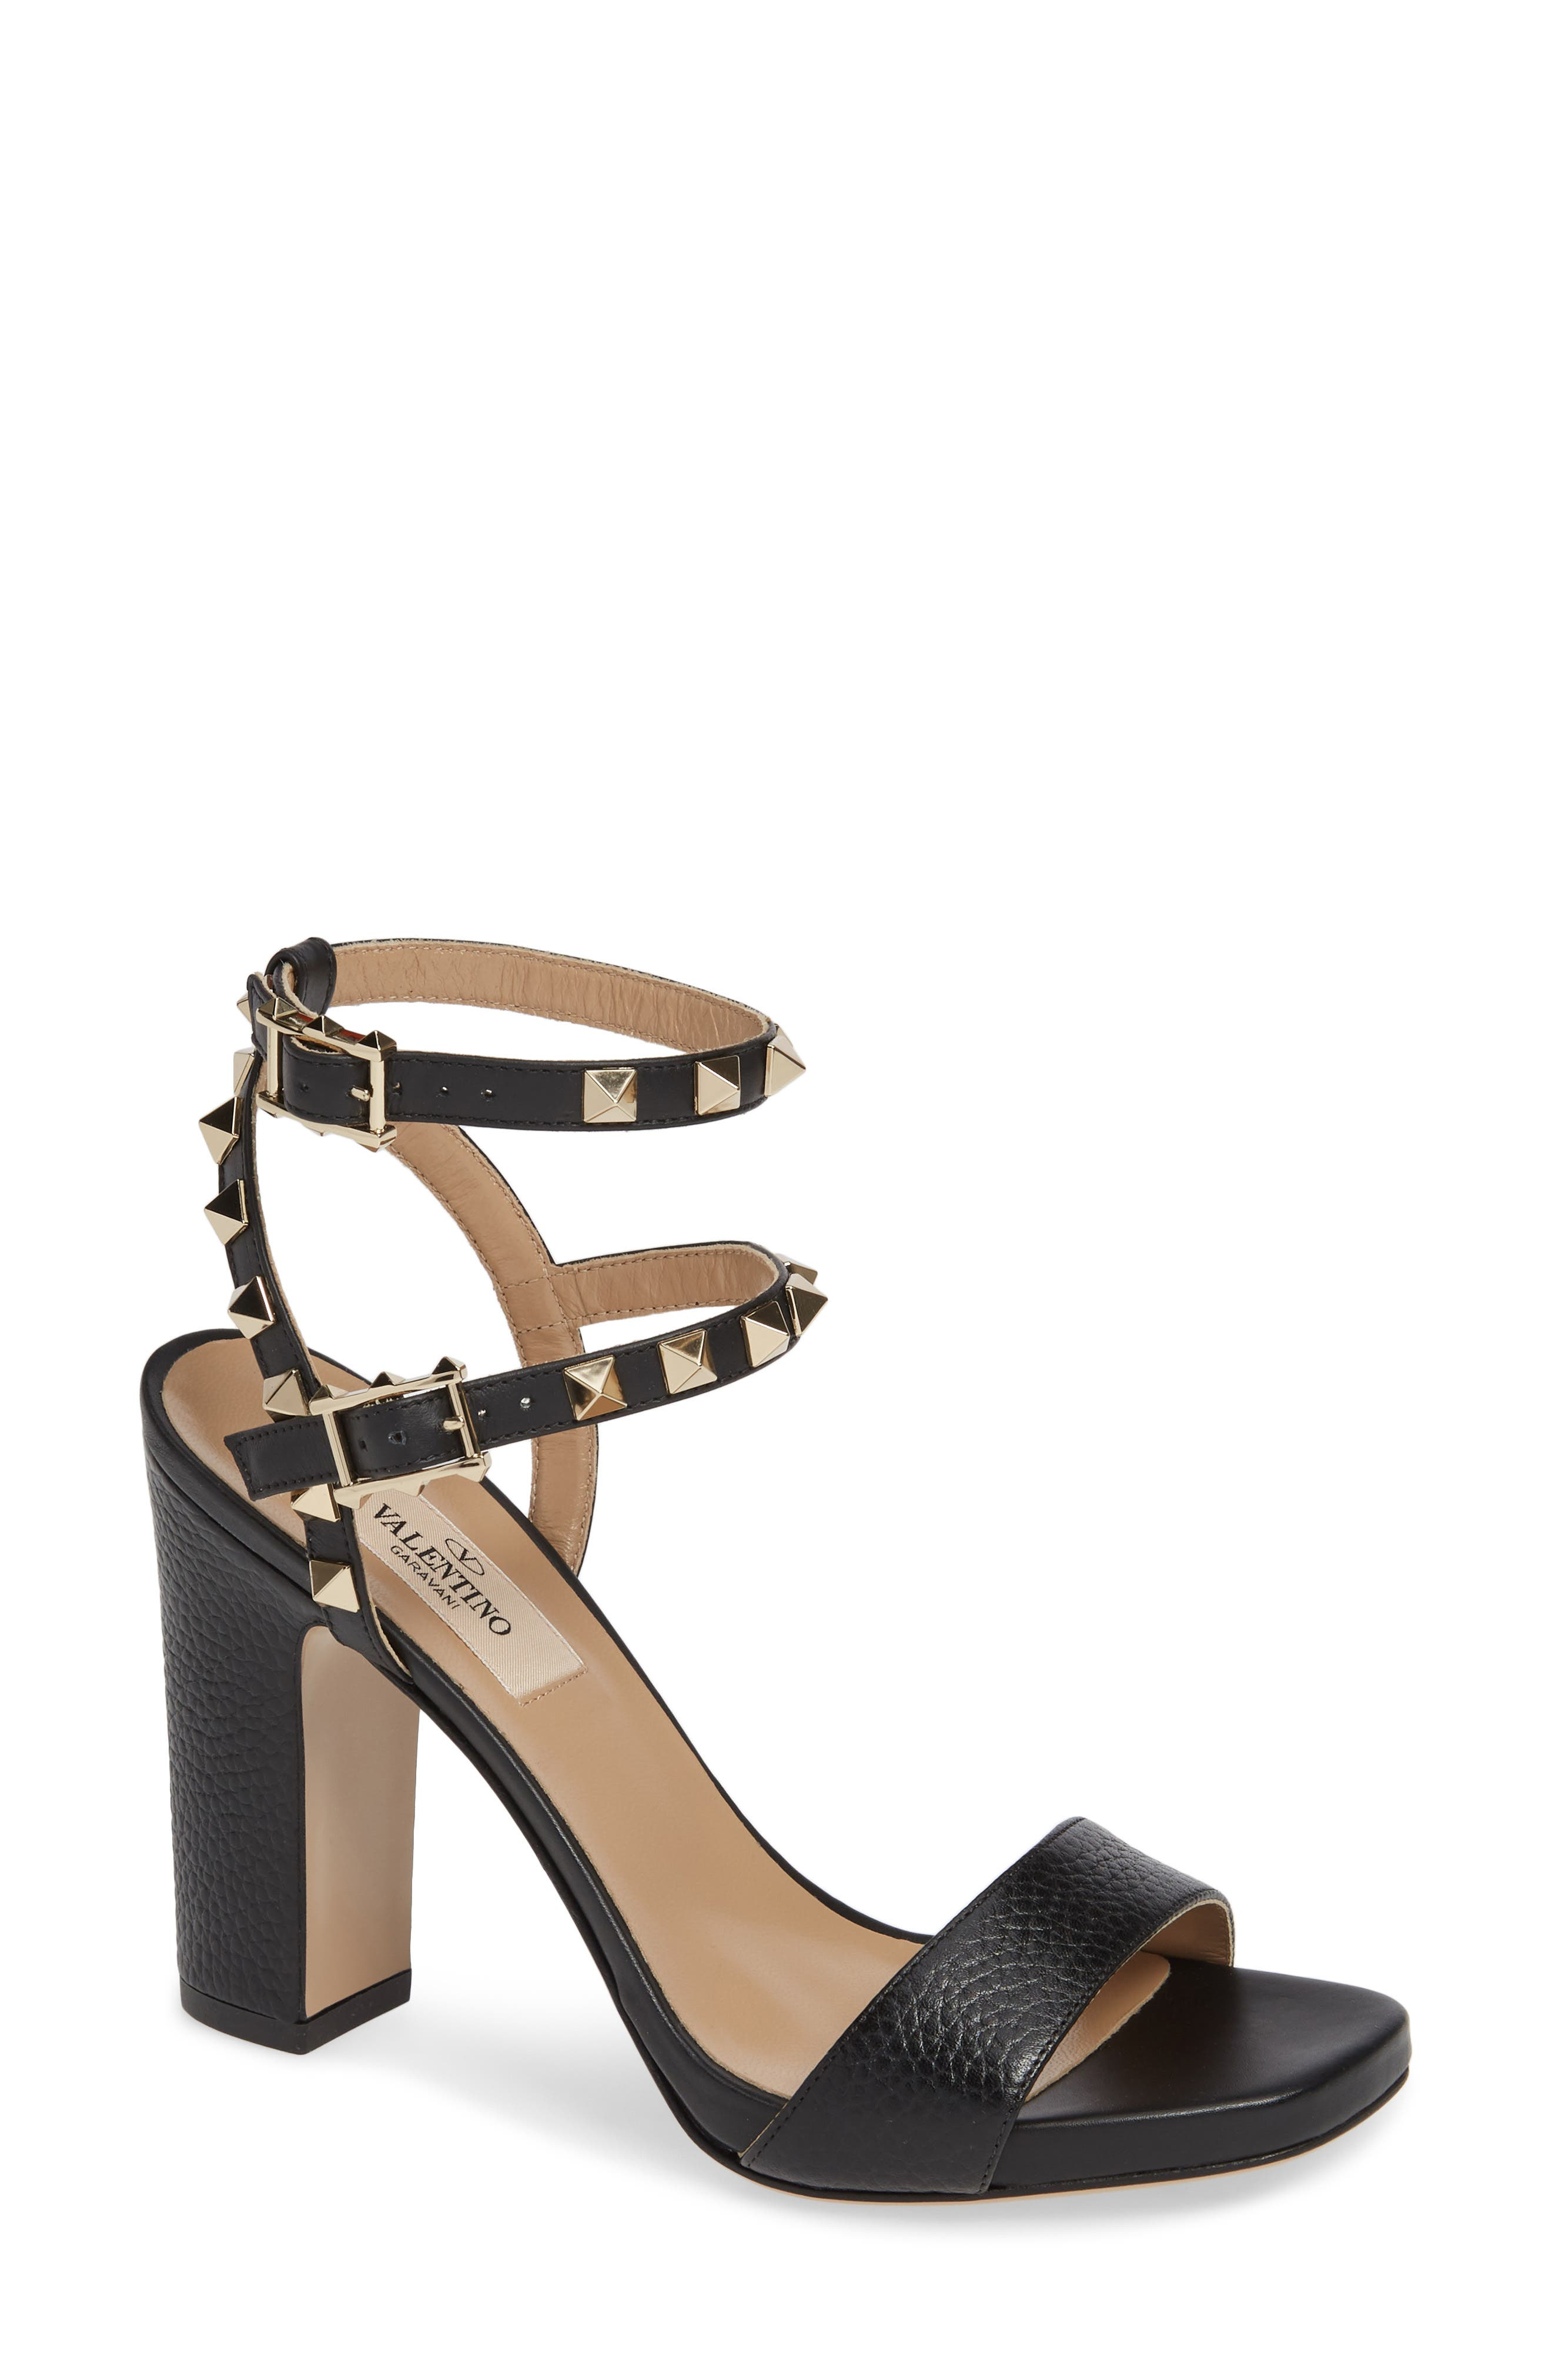 VALENTINO GARAVANI, Rockstud Ankle Strap Block Sandal, Main thumbnail 1, color, BLACK/ BLACK